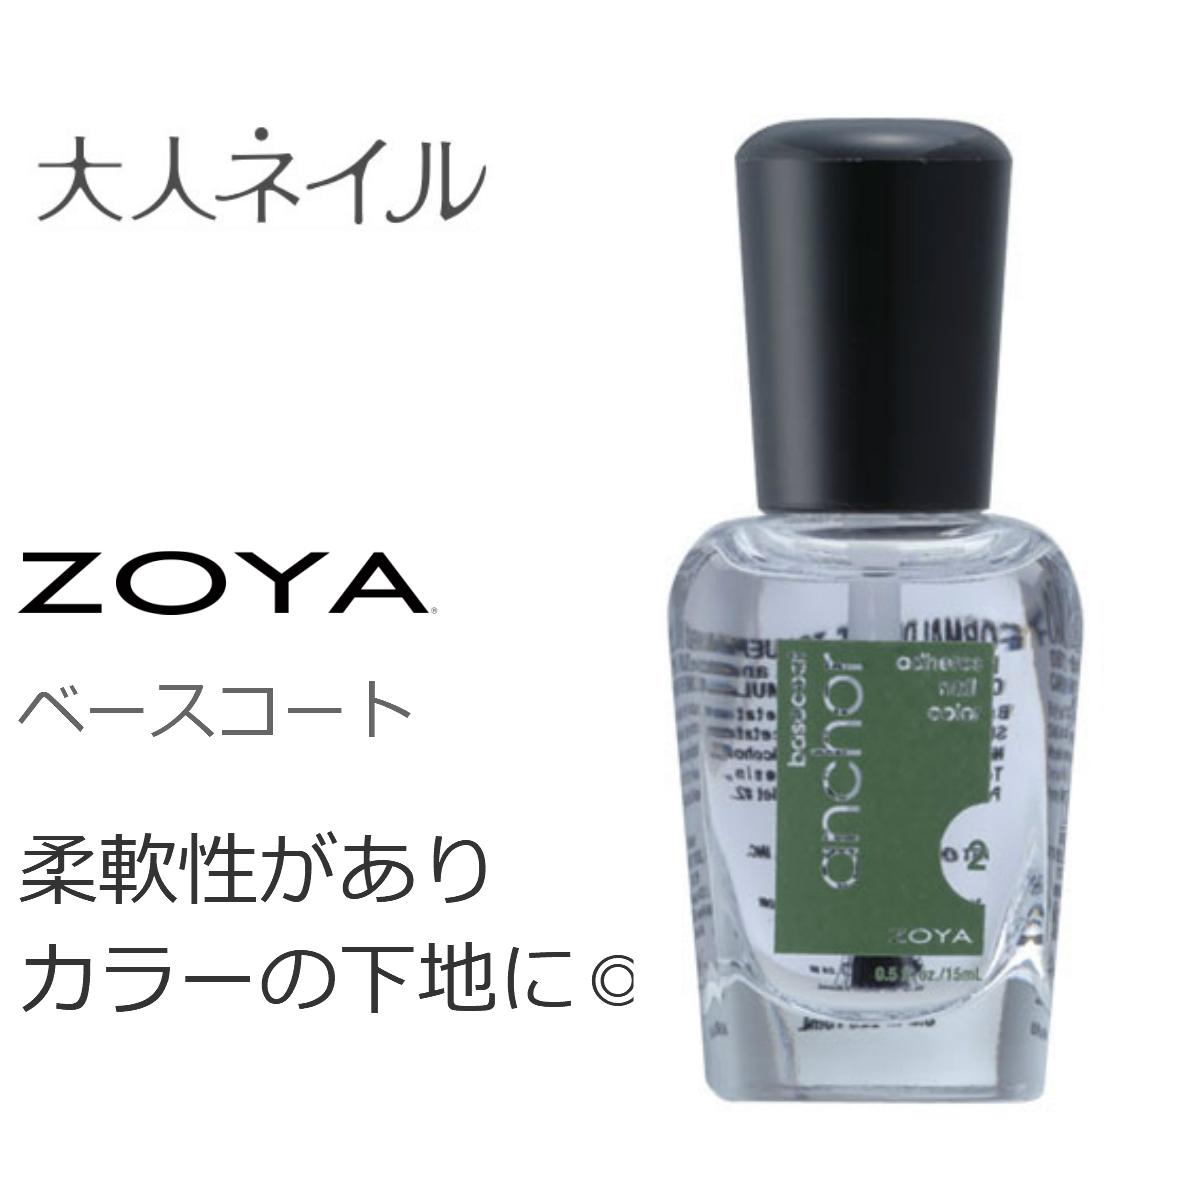 ZOYA ゾヤ ゾーヤ アンカーベースコート ZTAN01 15mL 柔軟性 カラー下地 長持ち